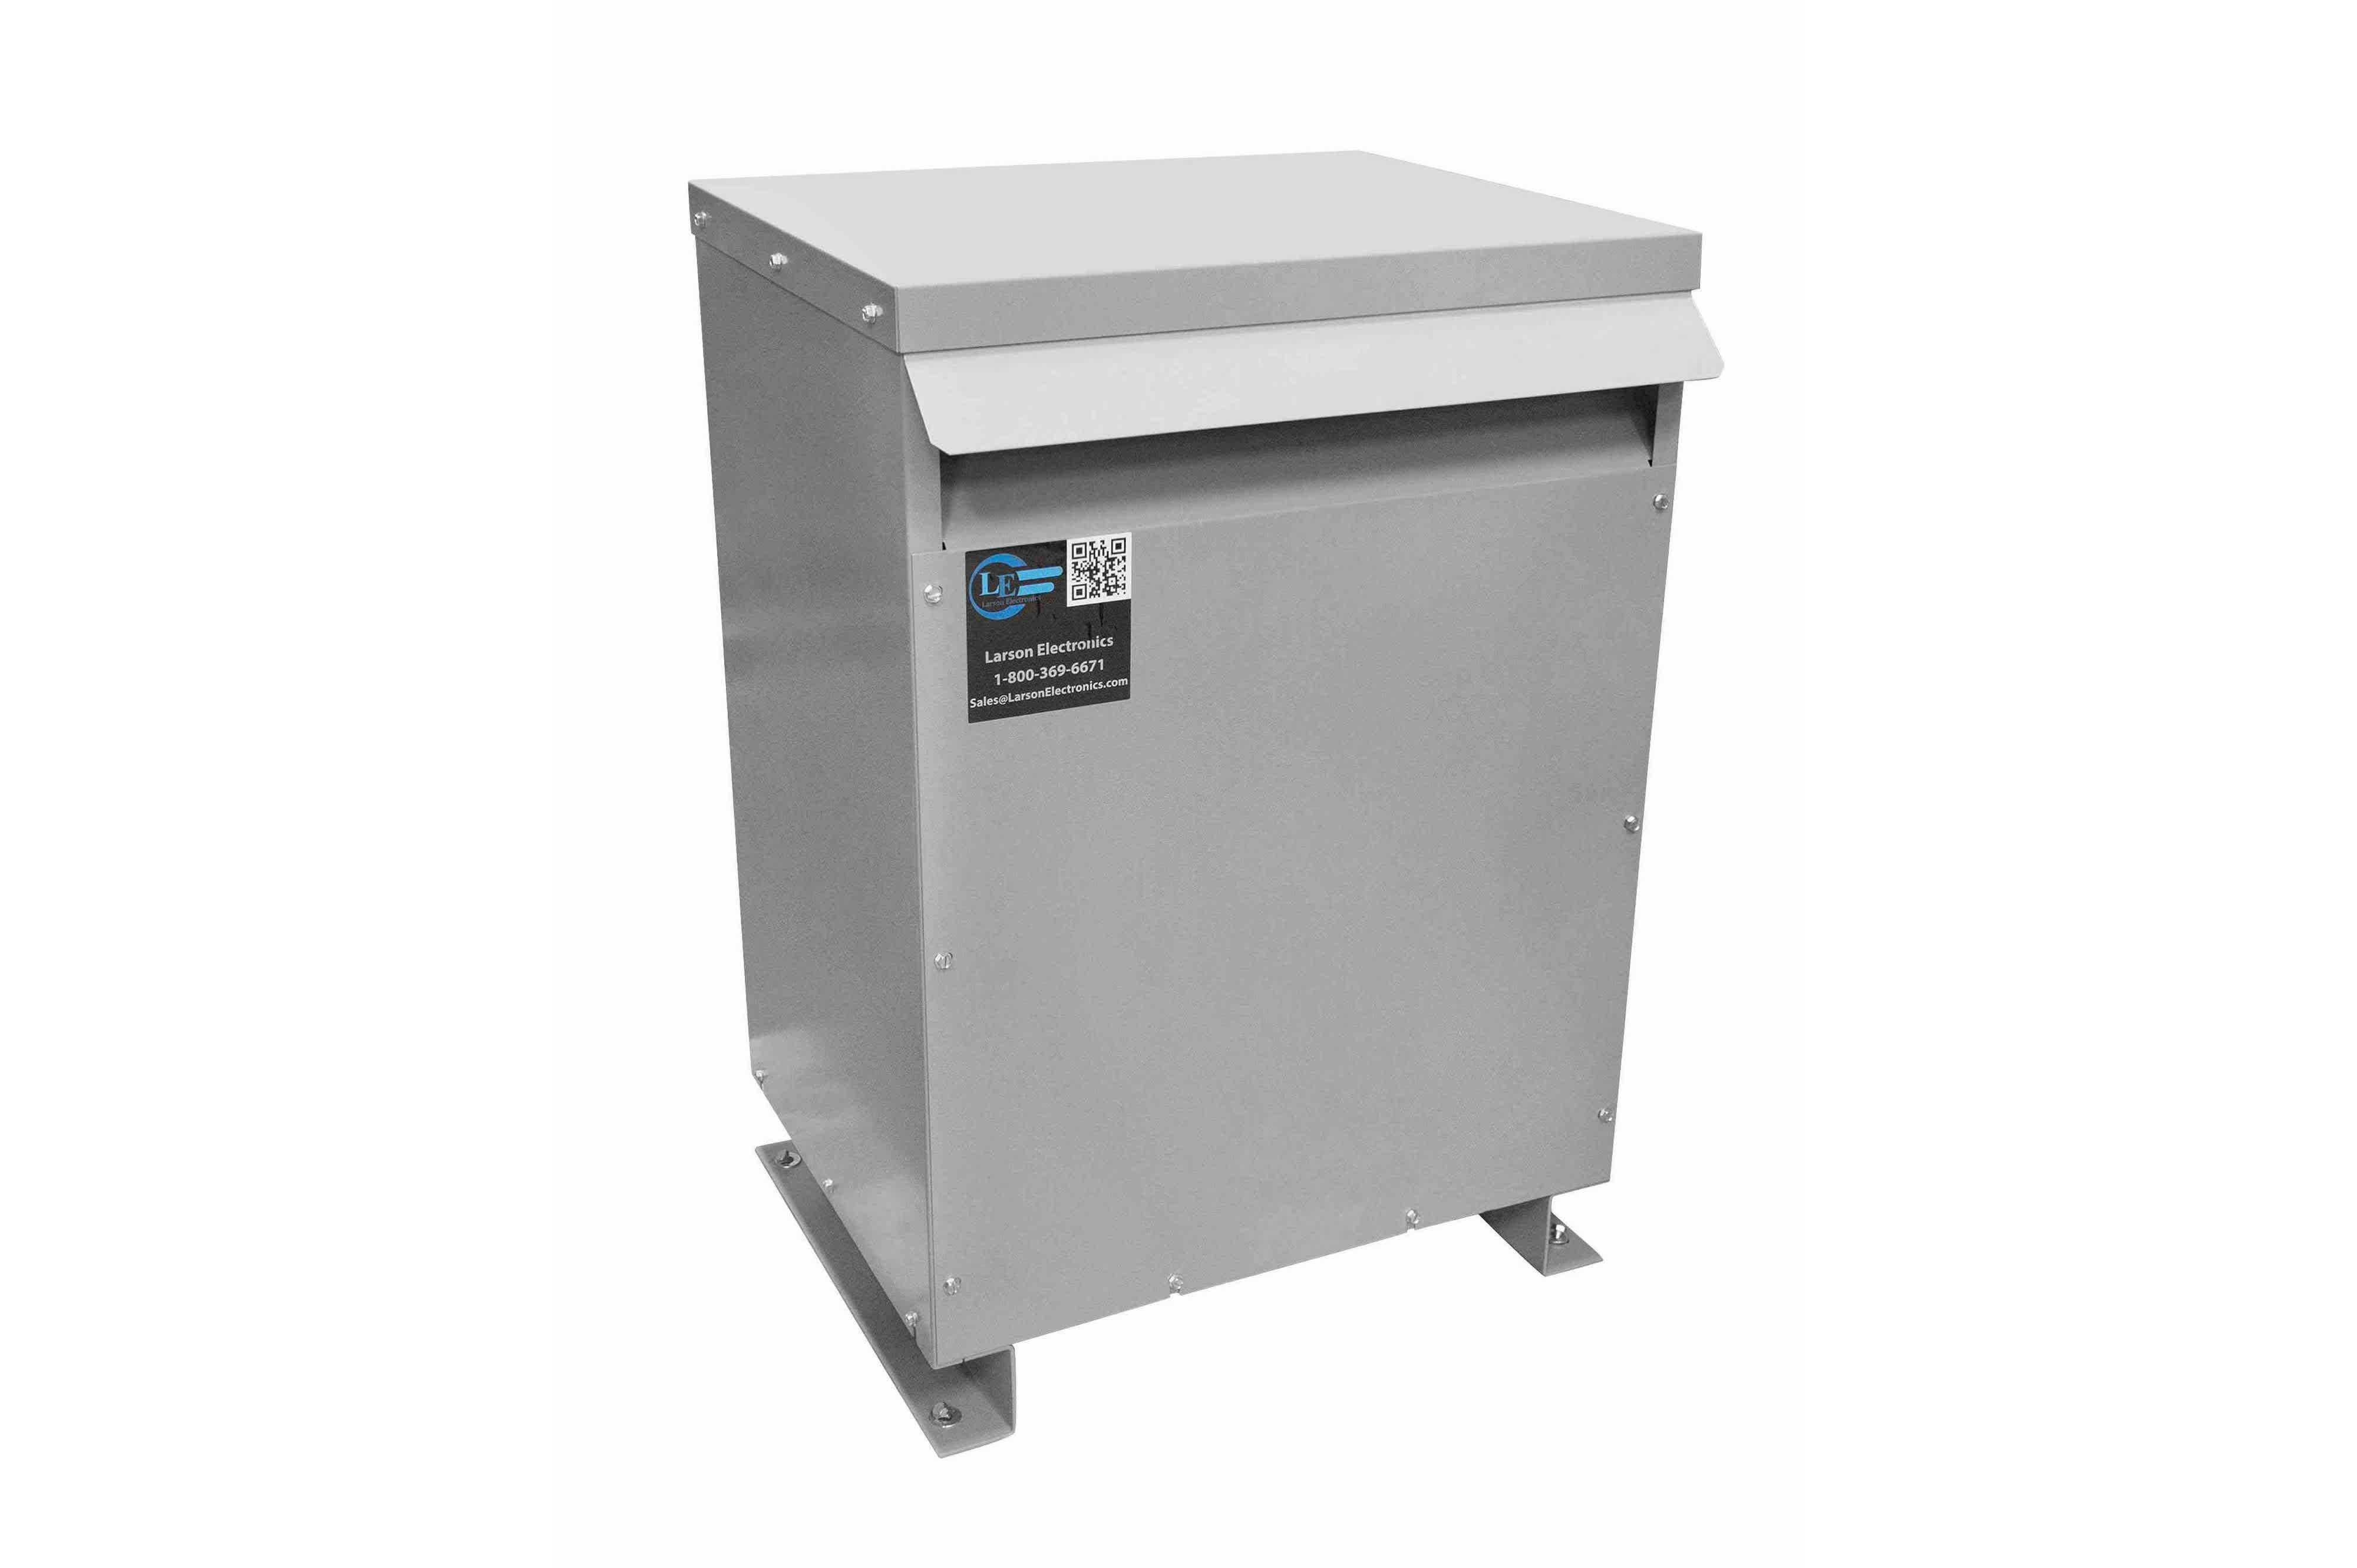 50 kVA 3PH Isolation Transformer, 440V Wye Primary, 240V/120 Delta Secondary, N3R, Ventilated, 60 Hz